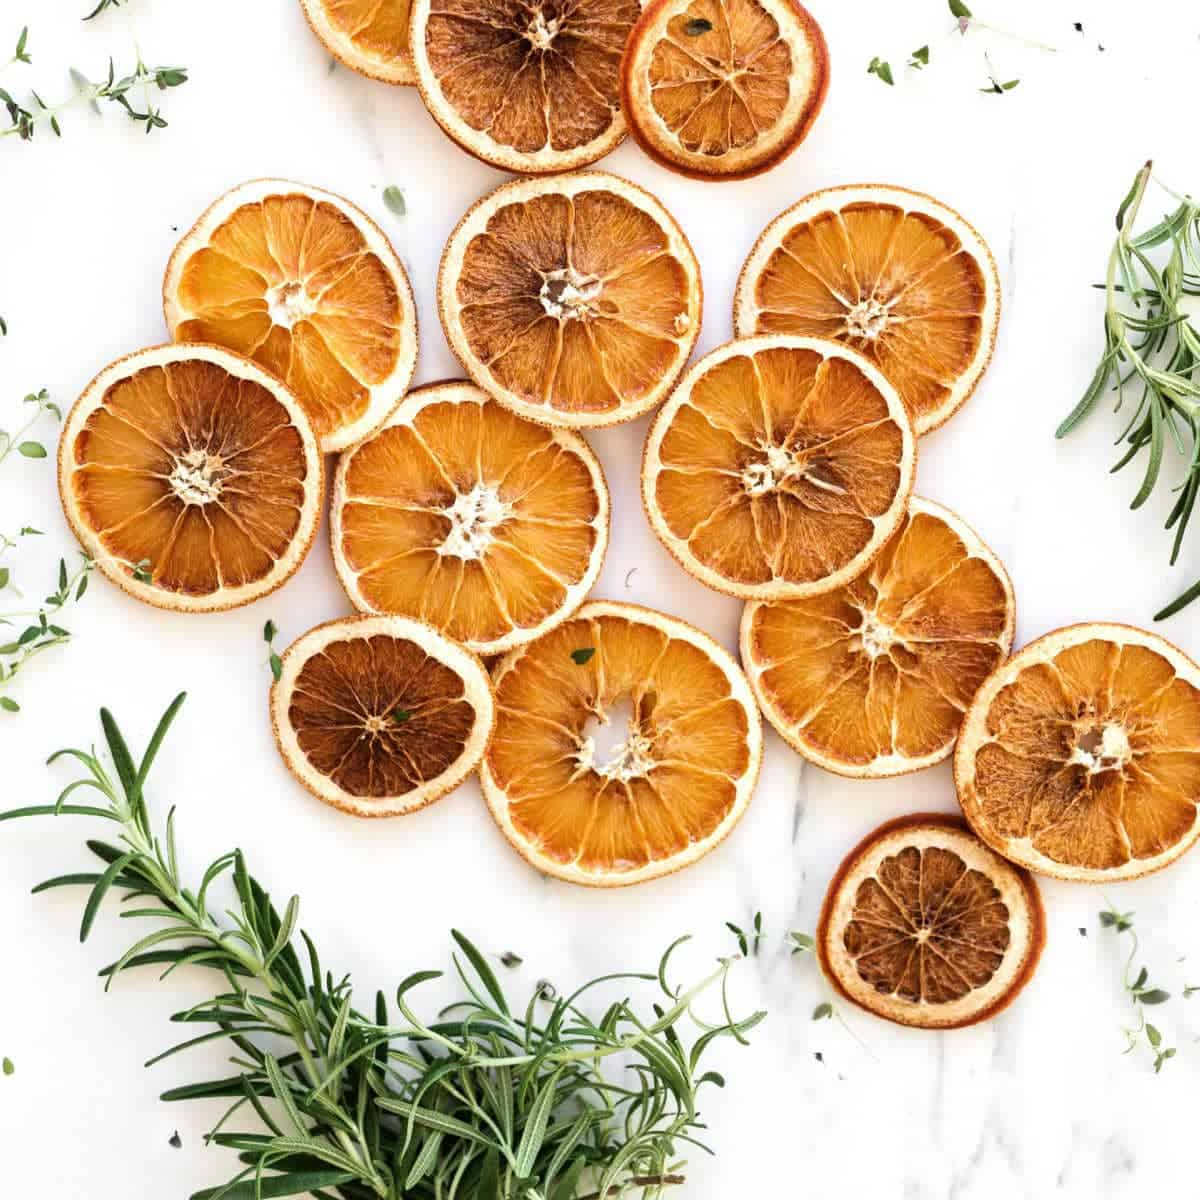 dried oranges on kitchen counter